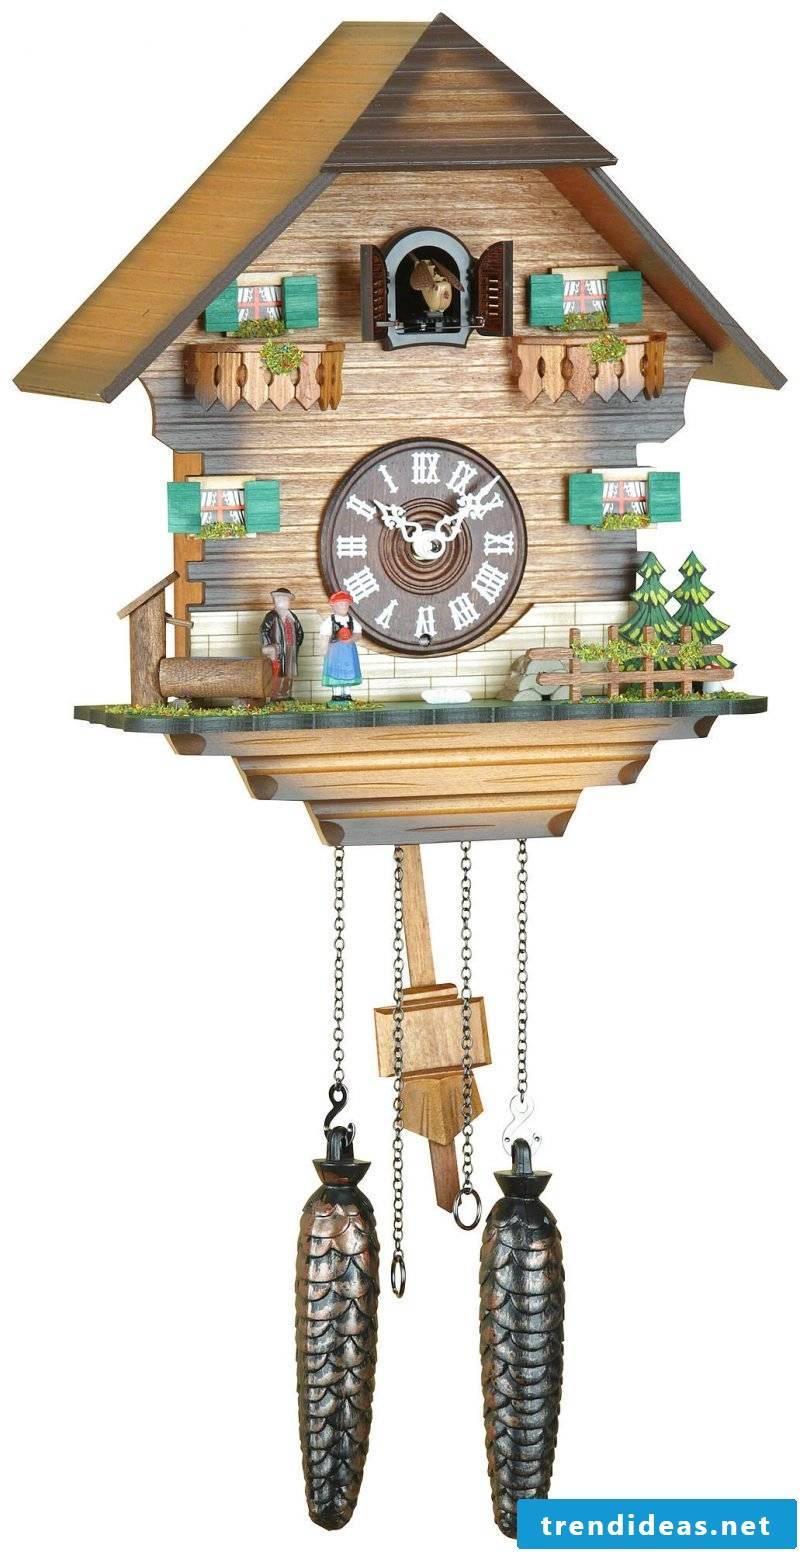 Cuckoo clock with birdhouse.